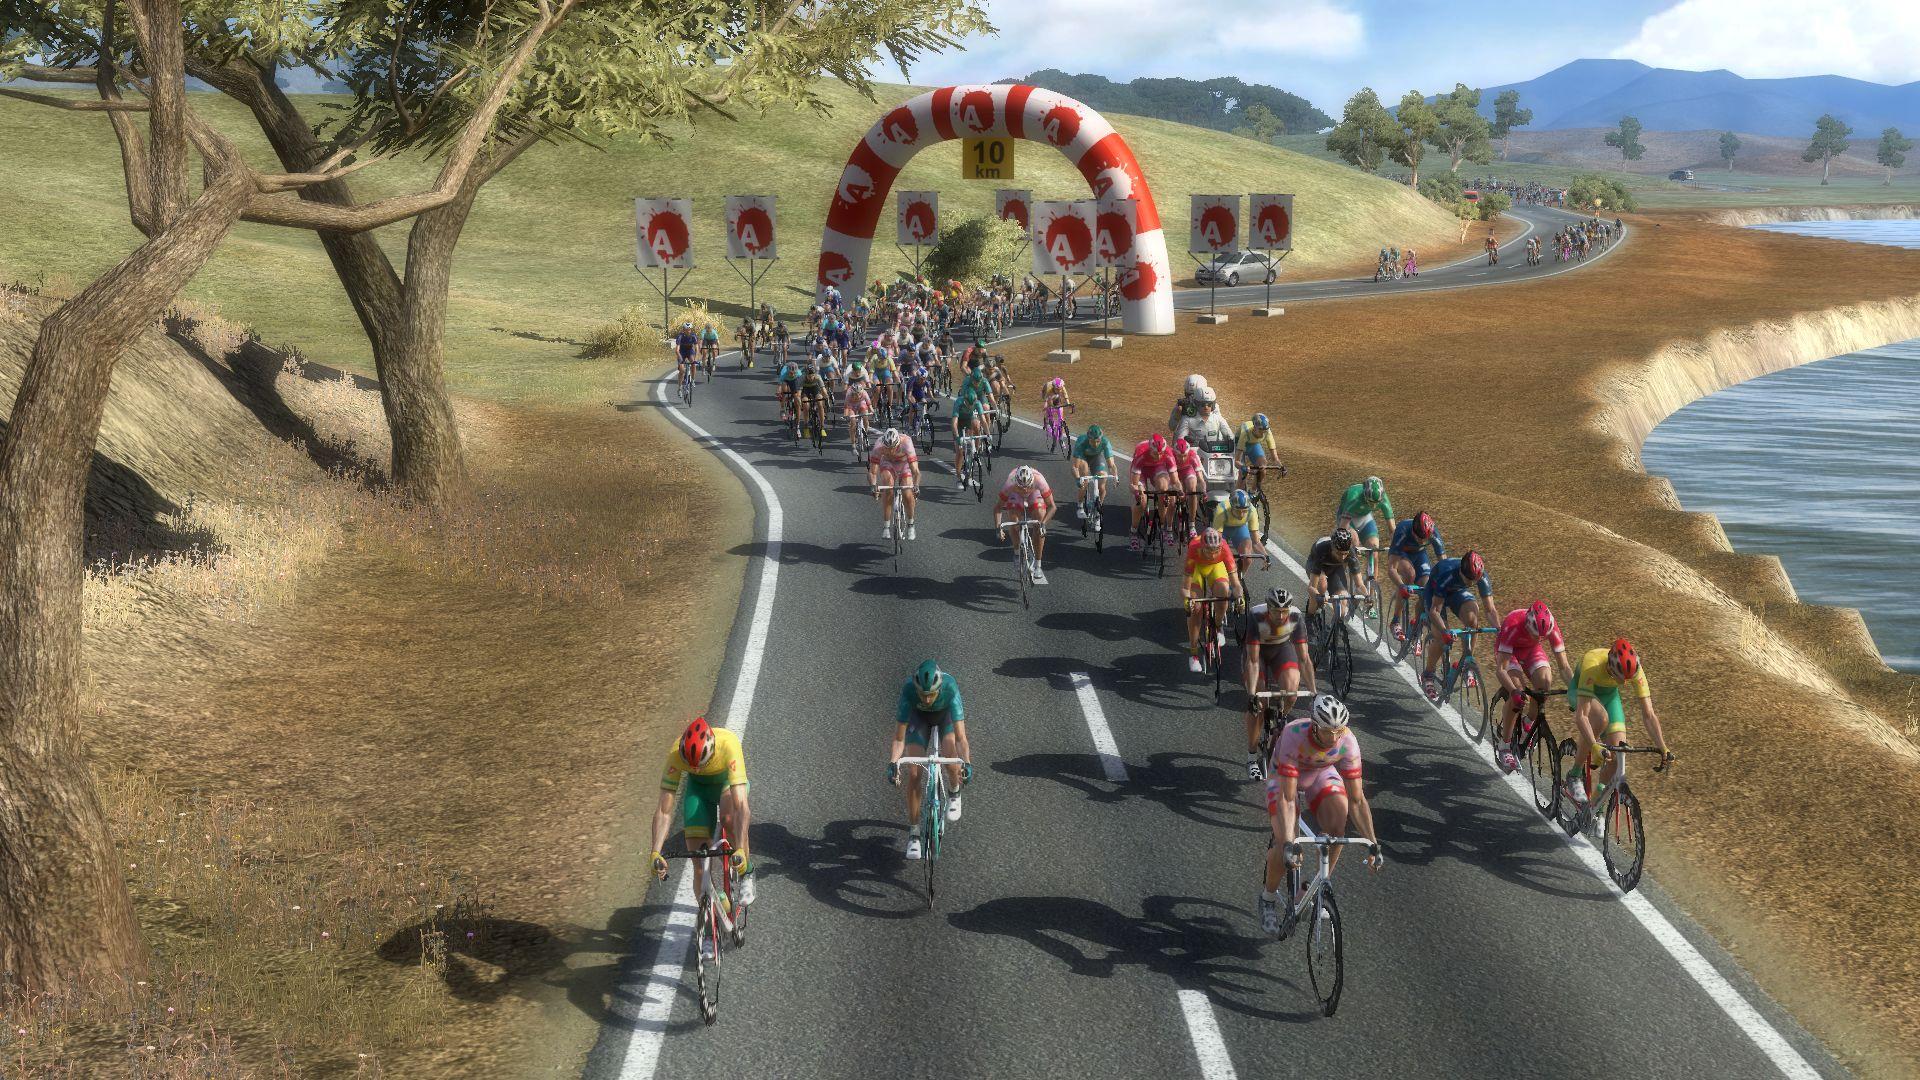 pcmdaily.com/images/mg/2019/Races/PTHC/East%20Java/JavaS1%206.jpg